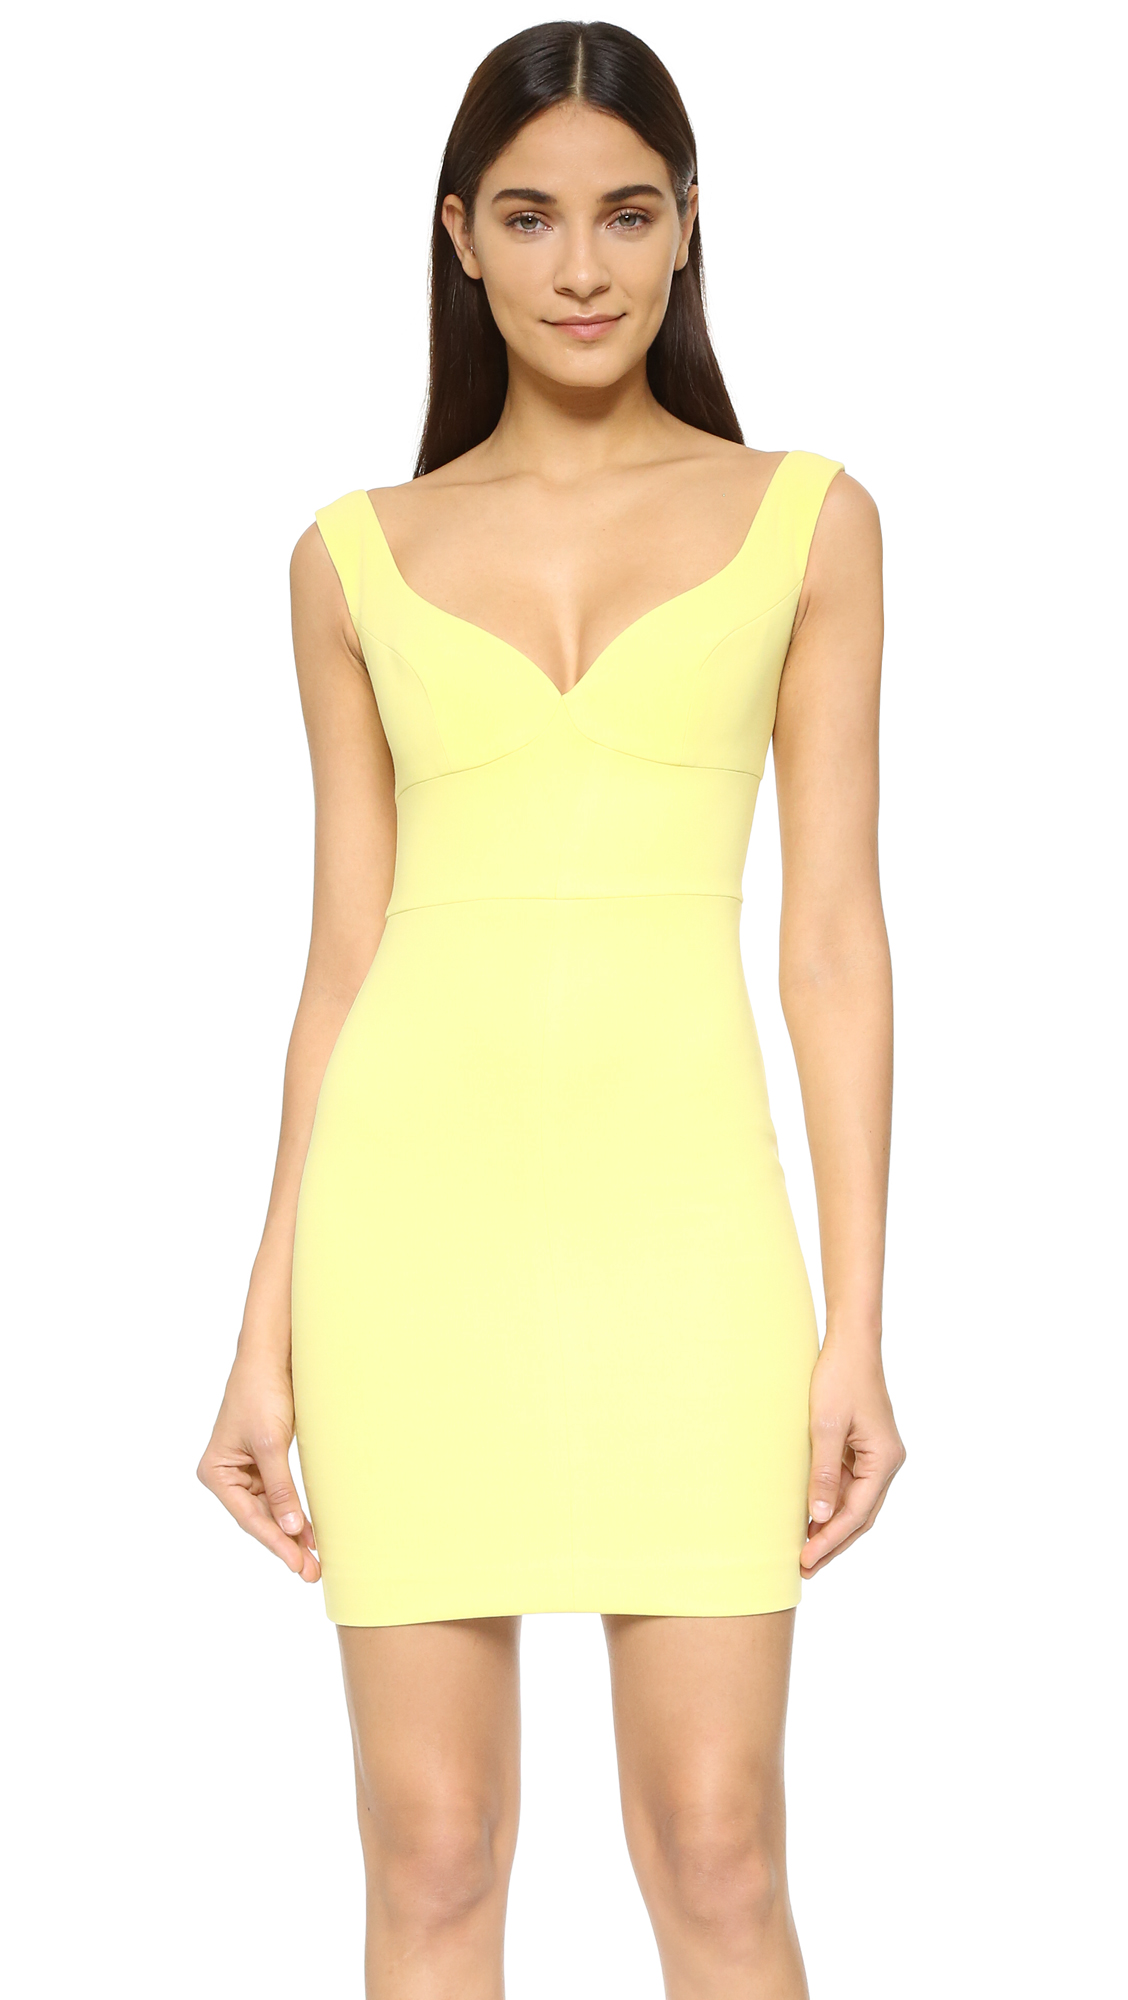 Black and yellow mini dress